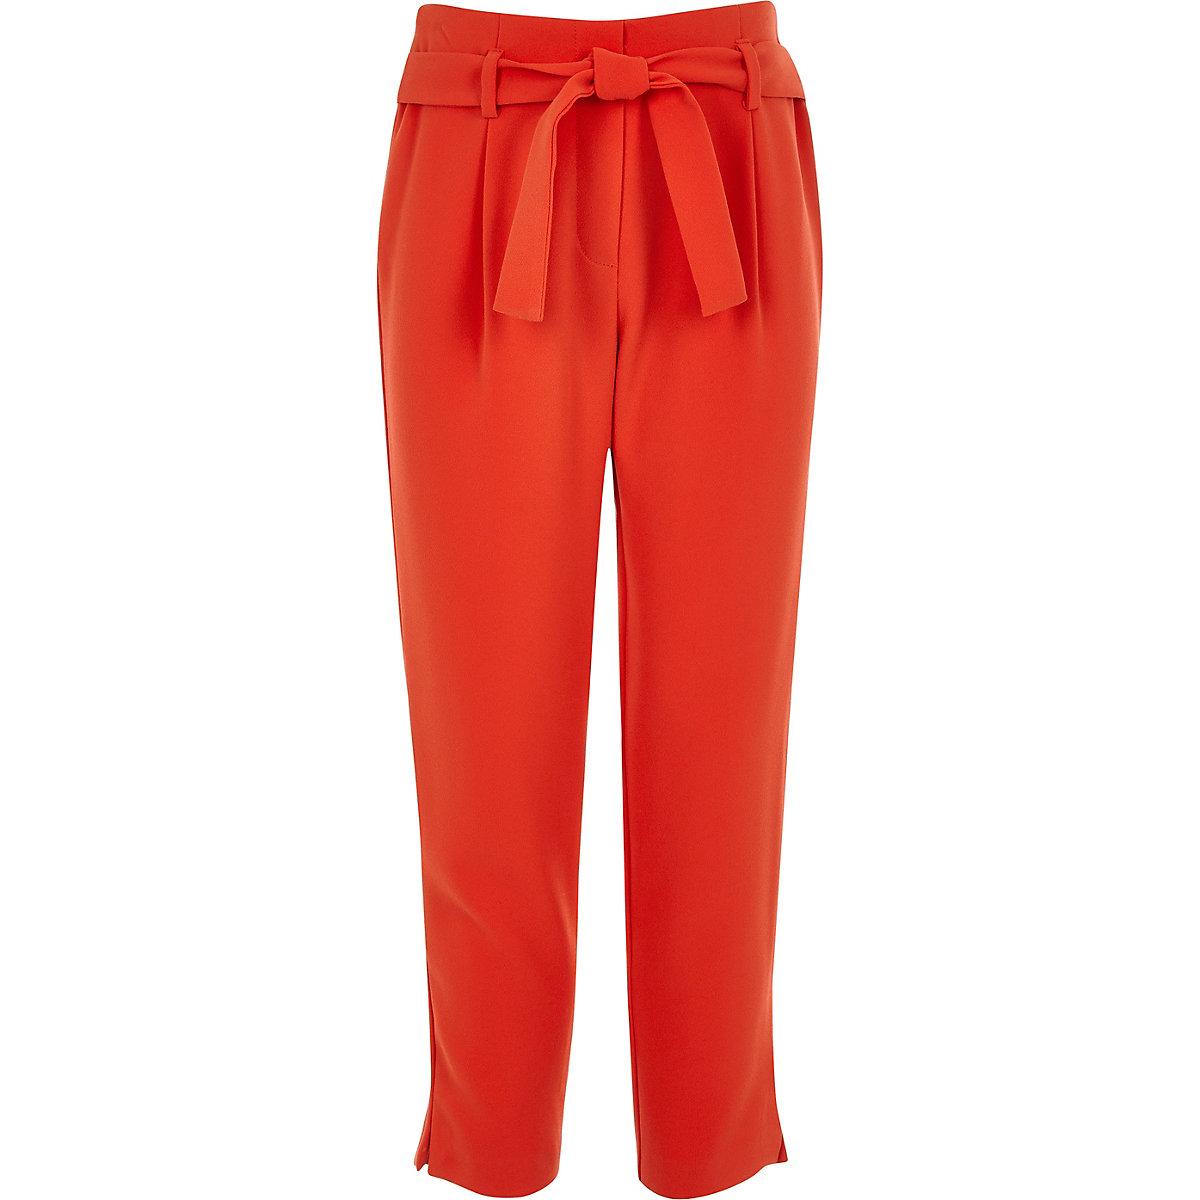 Girls red tie waist pants